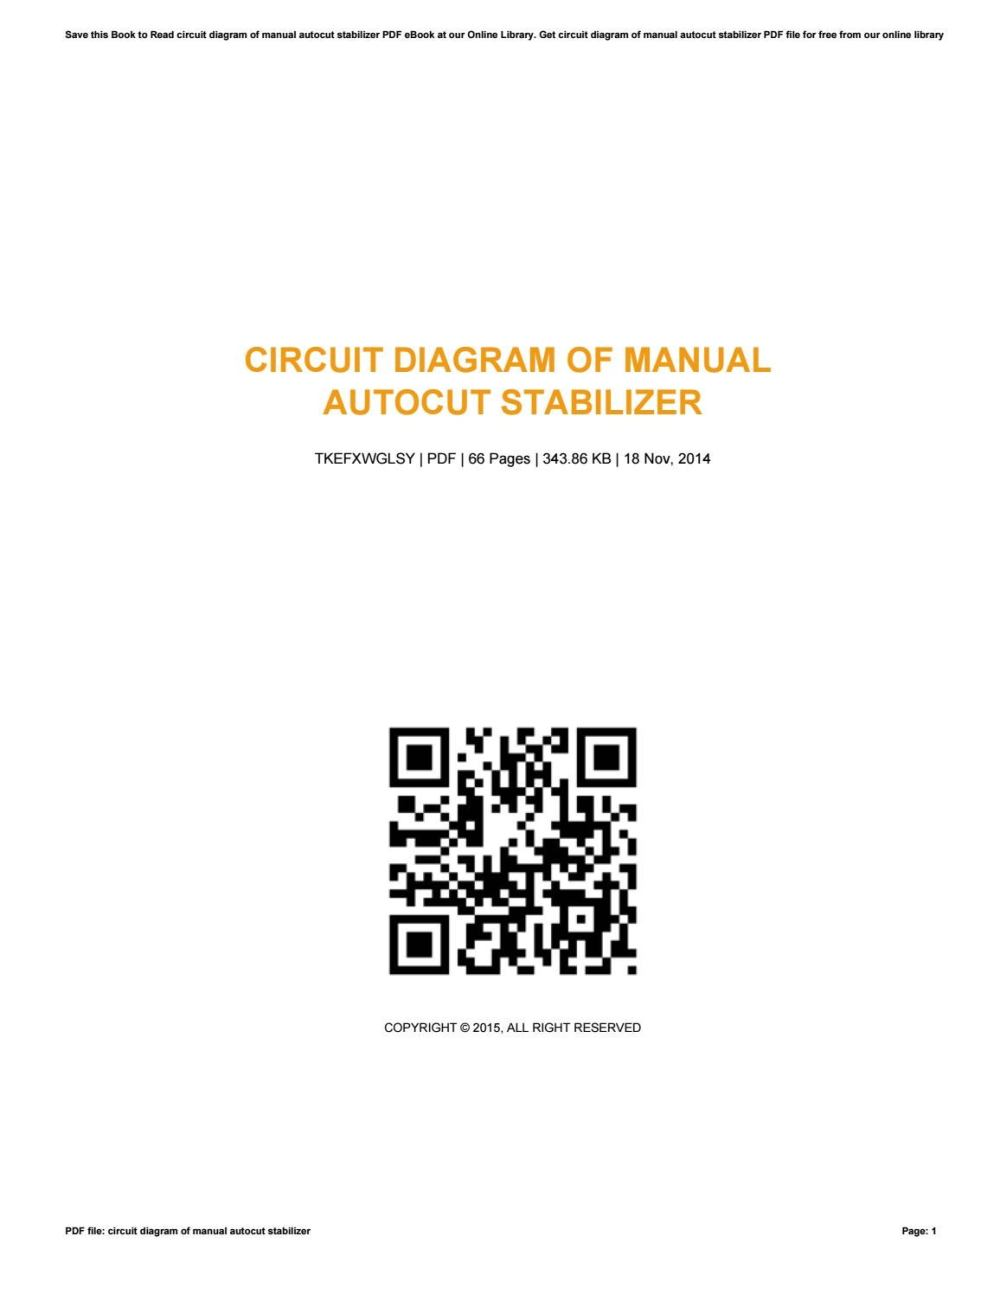 medium resolution of circuit diagram of manual autocut stabilizer by thelmahonaker4284 issuu